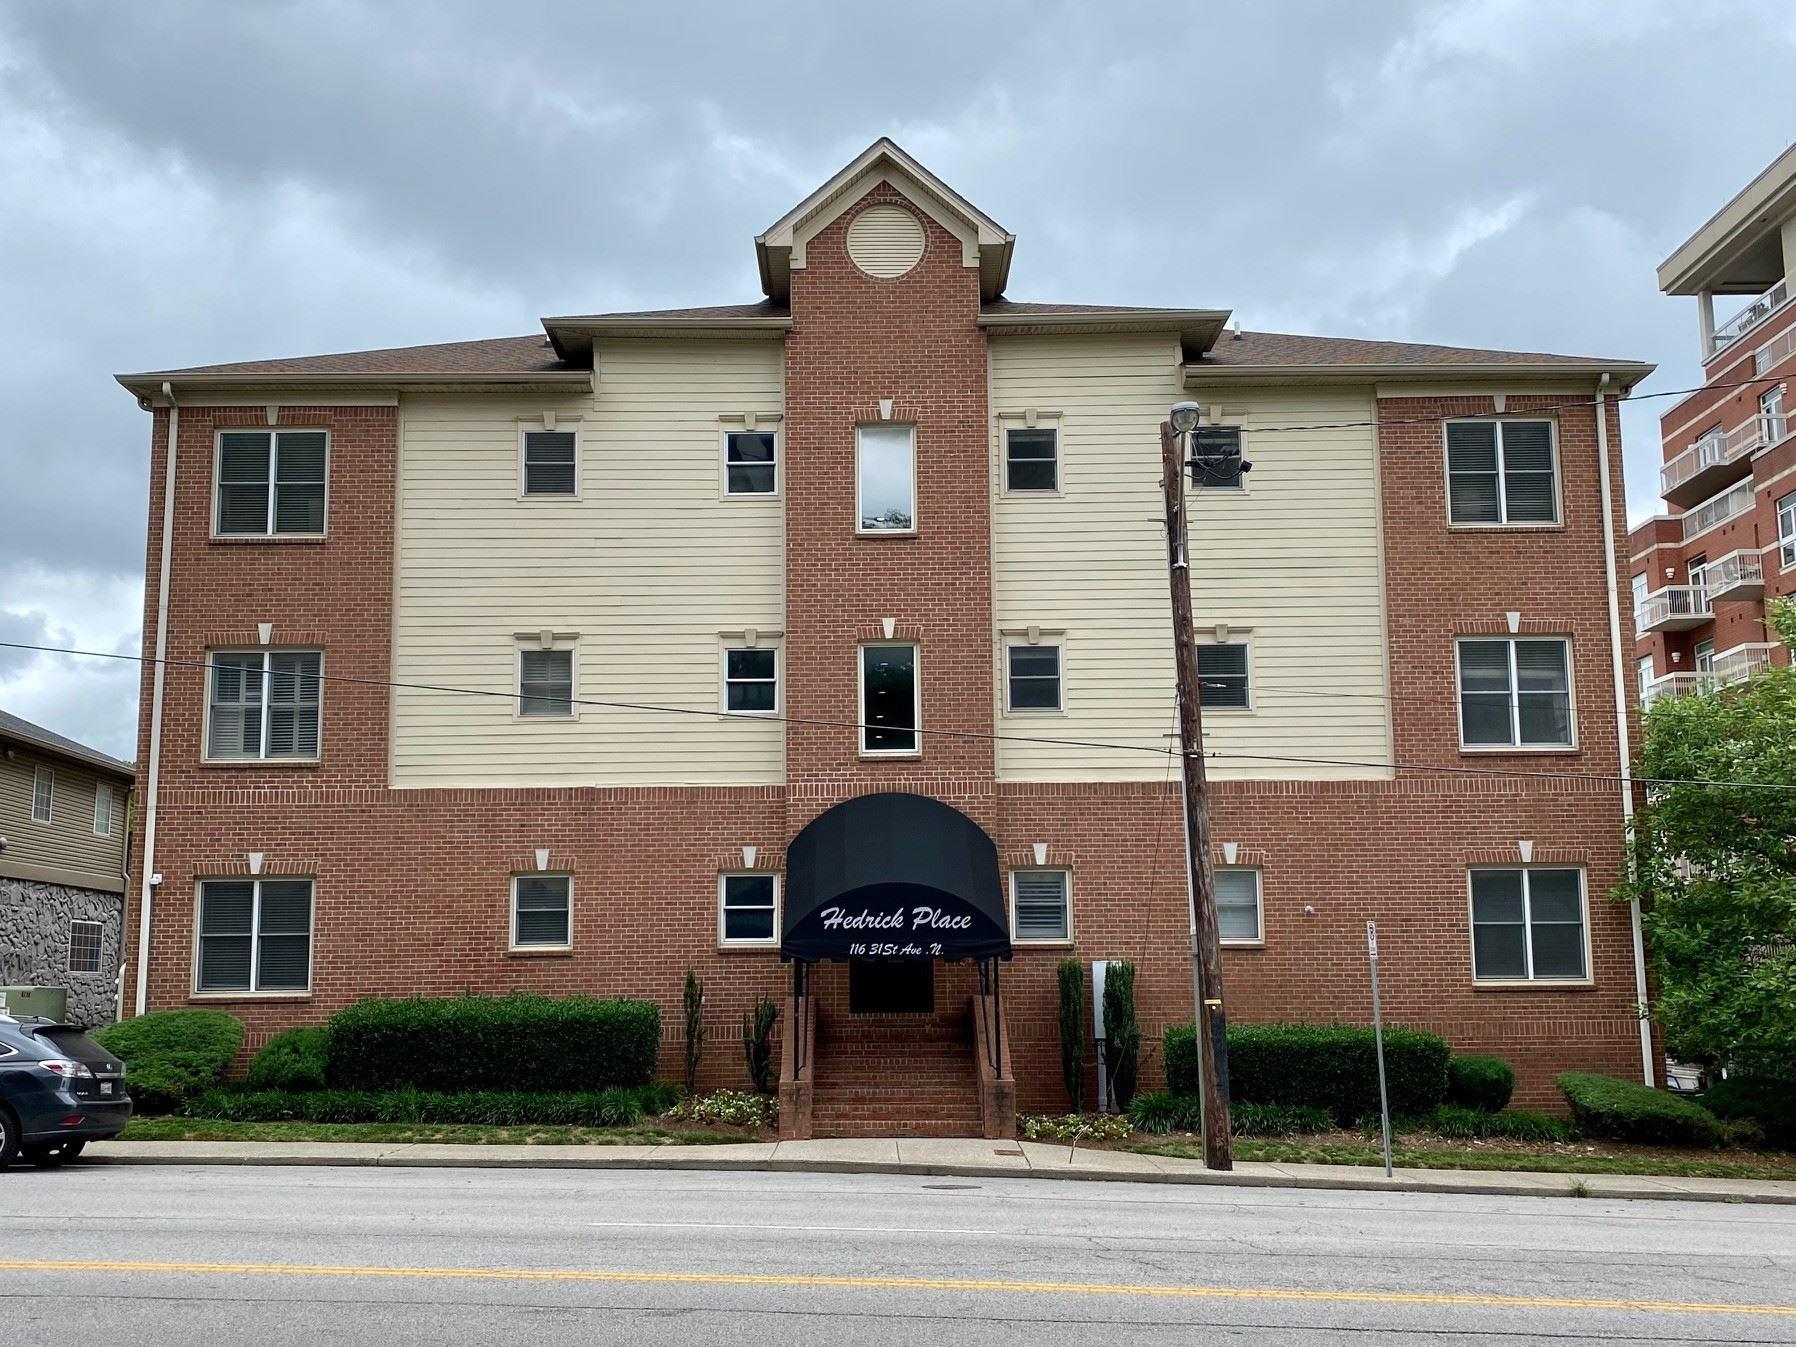 Photo of 116 31st Ave N #103, Nashville, TN 37203 (MLS # 2253571)